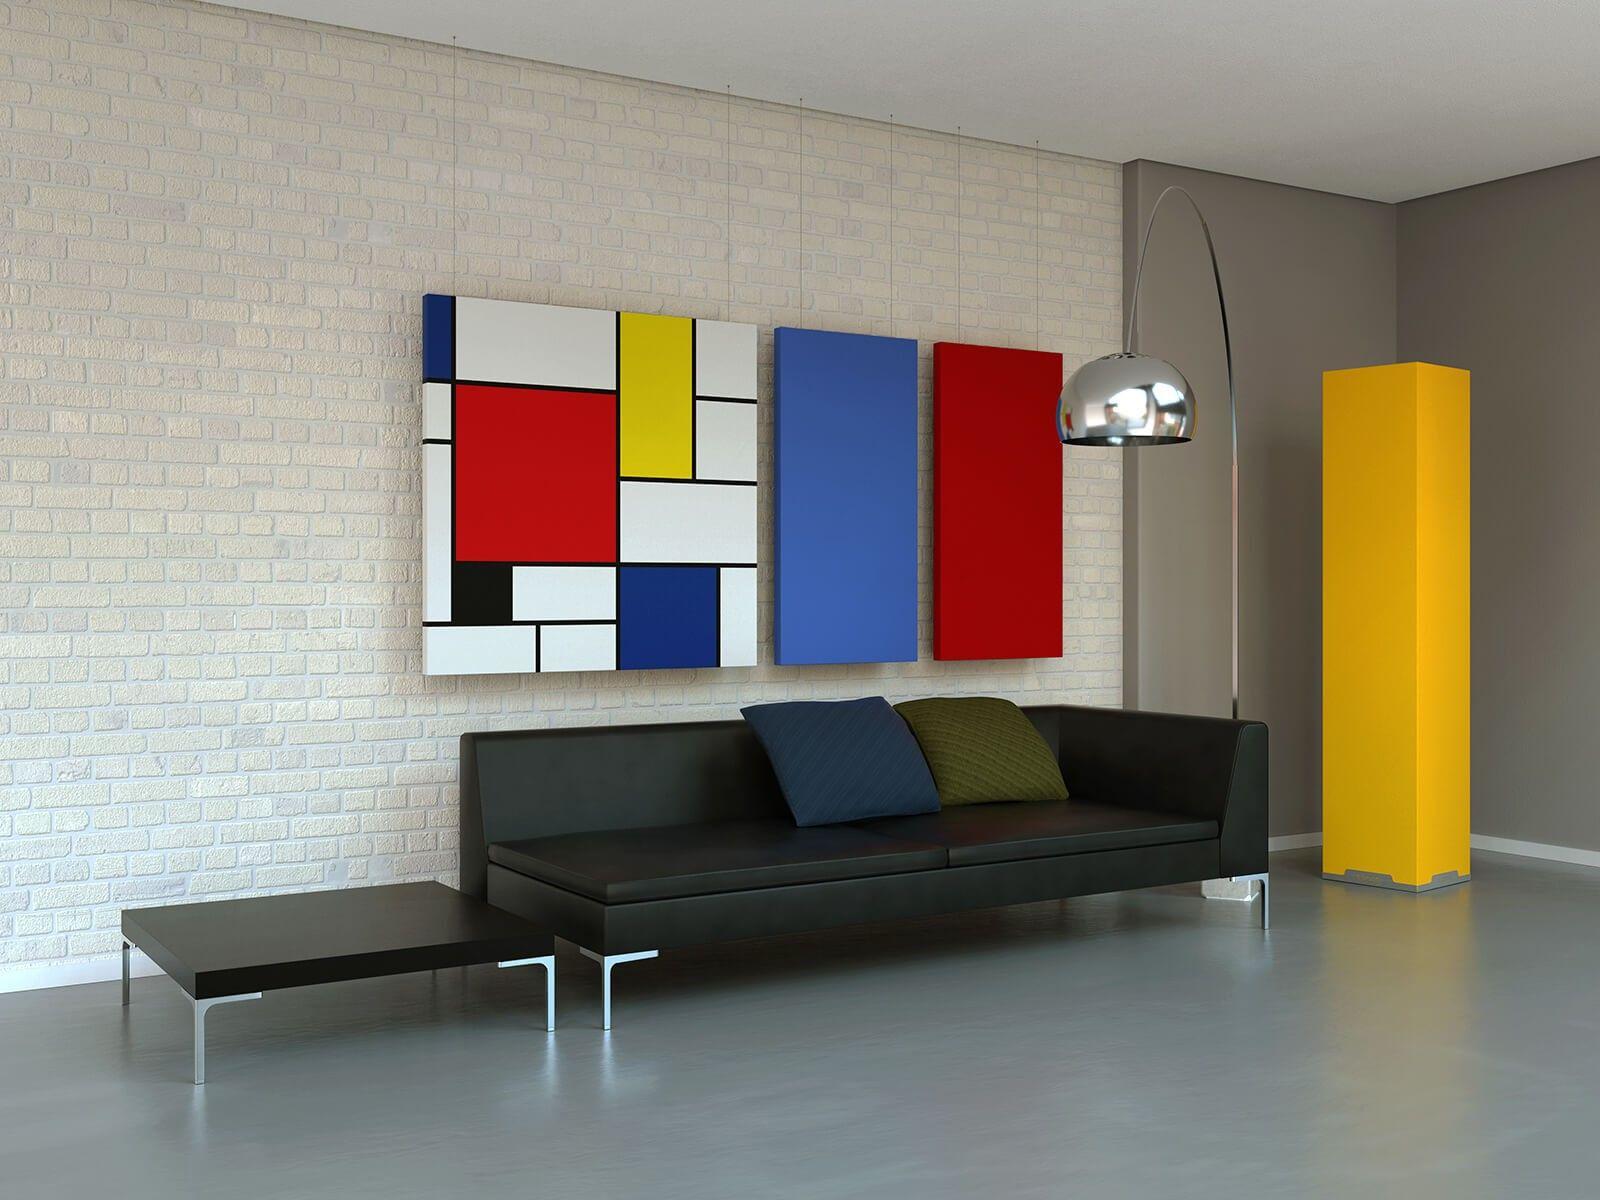 Interior Soundproof Panels Waiting Room Solutions Stylish Living Room Furniture Interior Room Interior